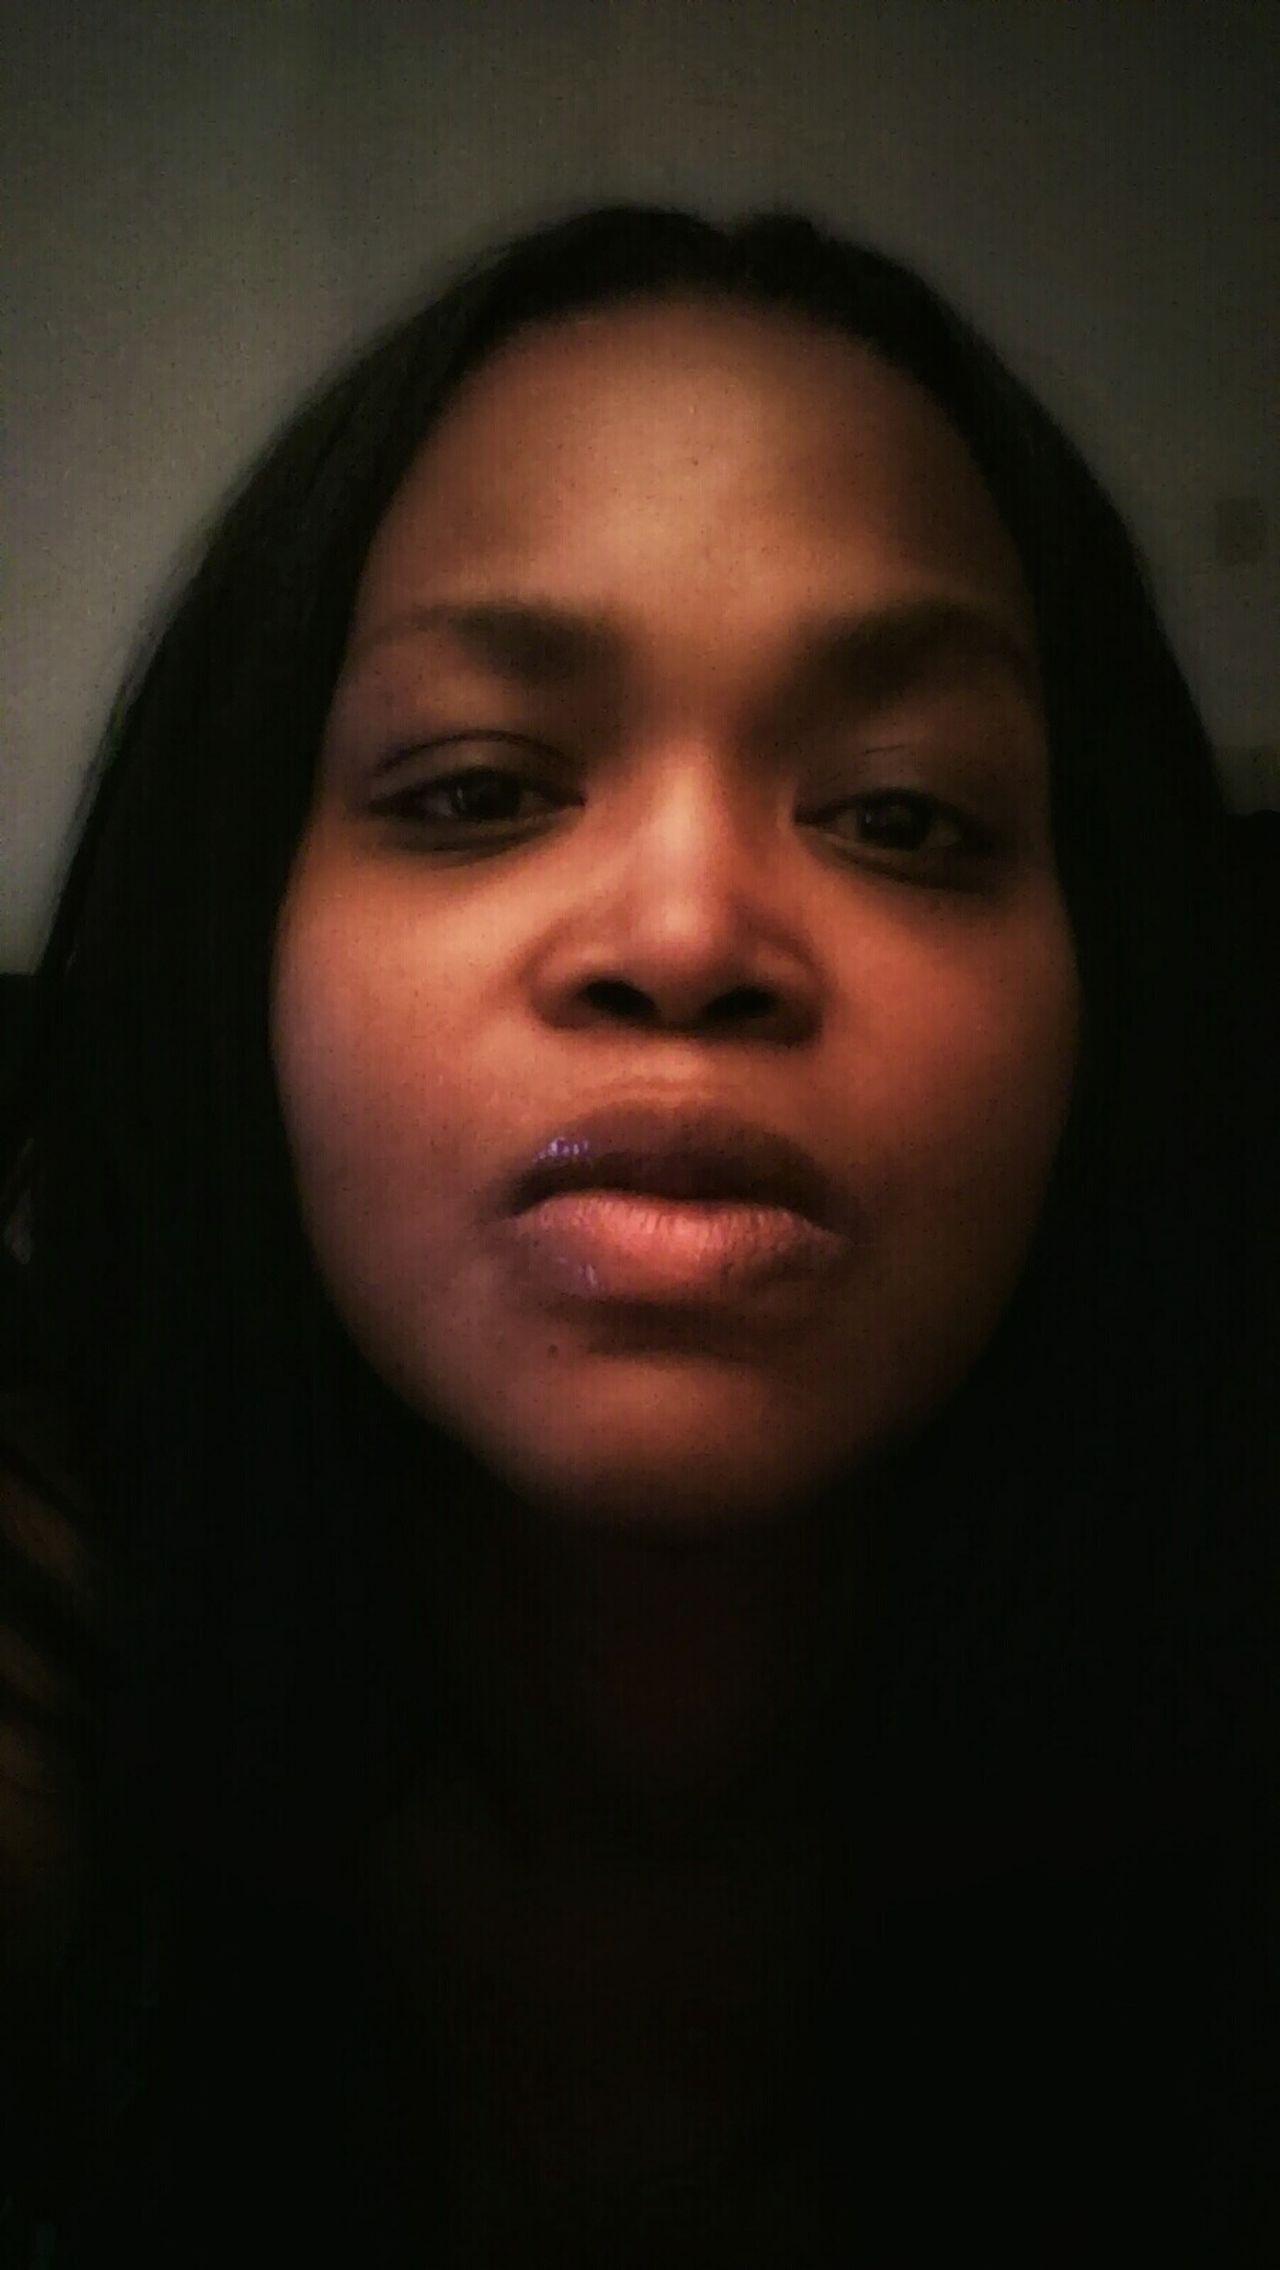 Mona Lisa Smile... Portrait Of A Woman Nubian Queen Nubian African American Woman Portraitist - 2016 Eyeem Awards Portrait One Woman Only Selfie Portrait One Young Woman Only Self Portrait Around The World Selfportrait_tuesday_nonchallenge